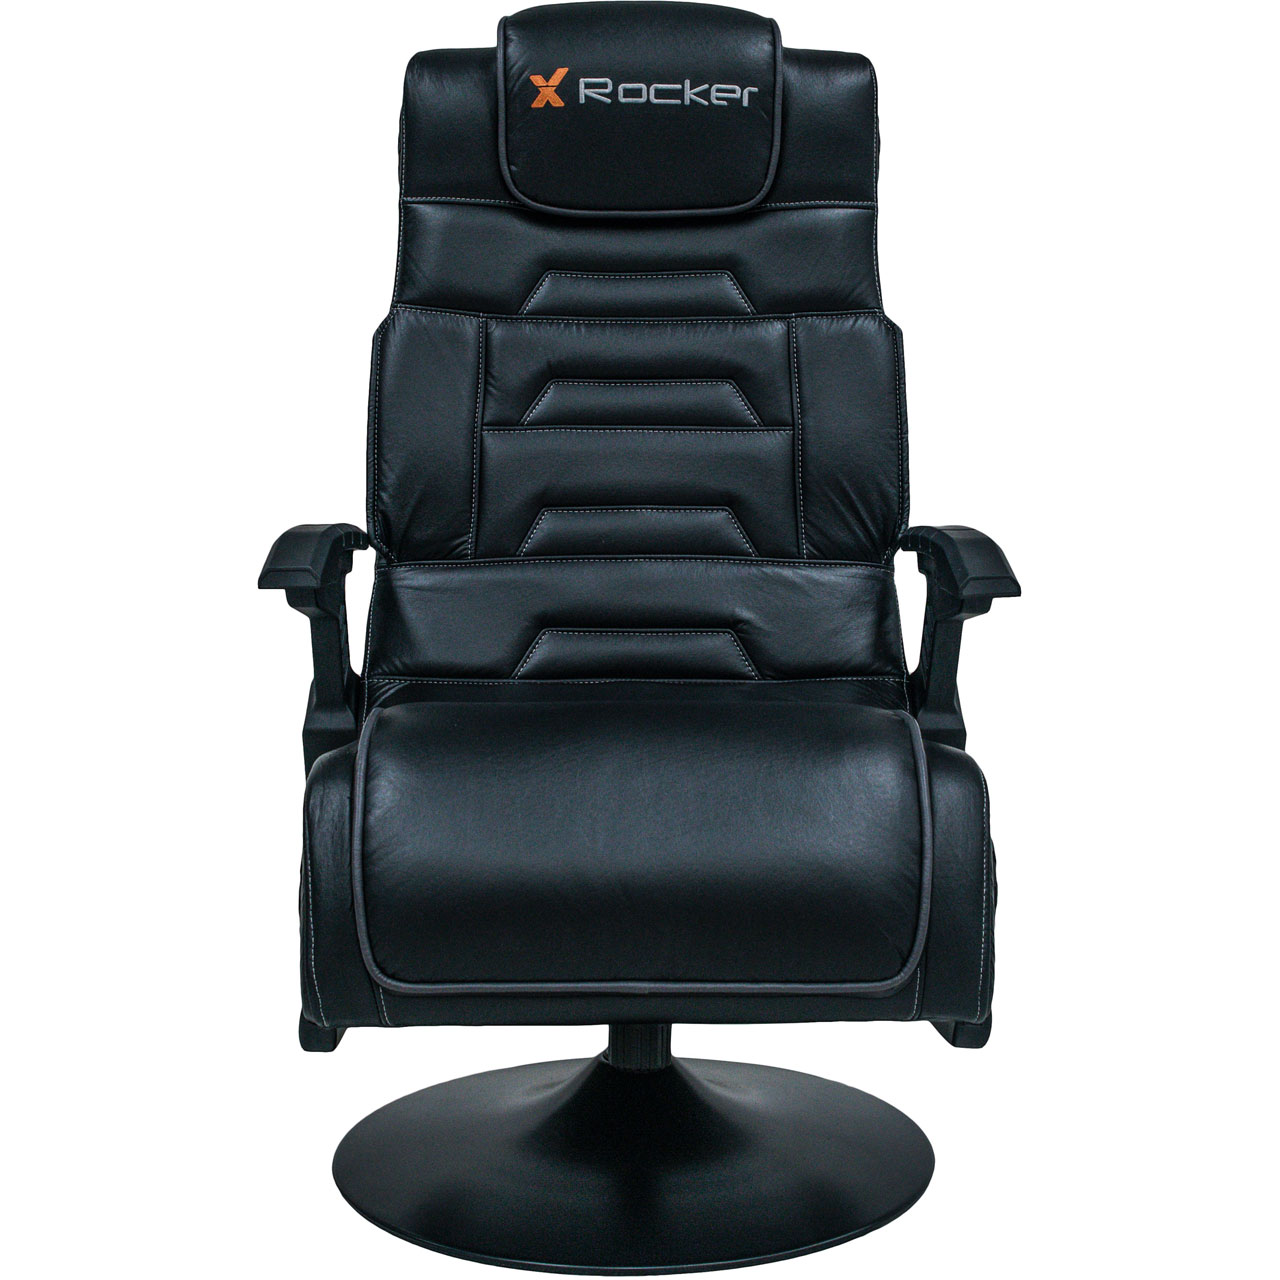 Cool X Rocker Wireless Pro 4 1 Gaming Chair Black Beatyapartments Chair Design Images Beatyapartmentscom